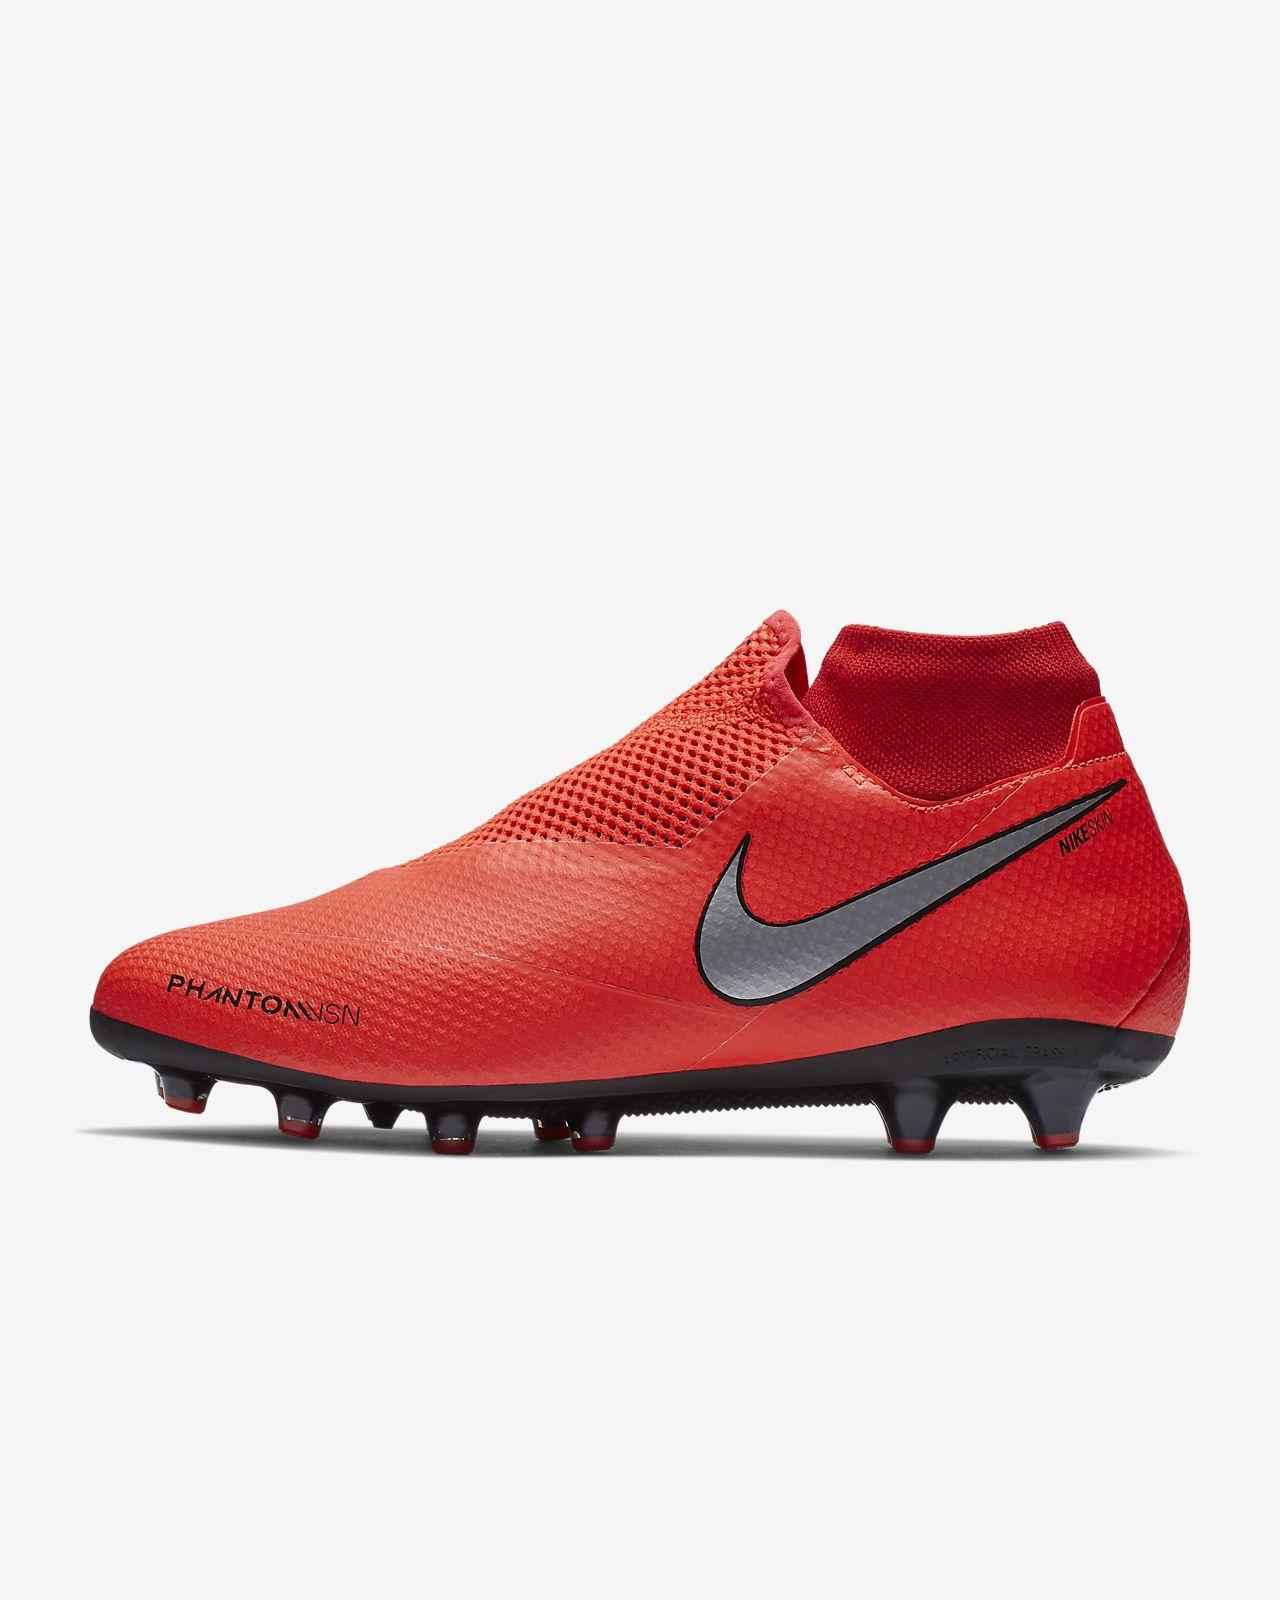 Nike Phantom Vision Pro Dynamic Fit Ag Pro Fussballschuh Fur Kunstrasen